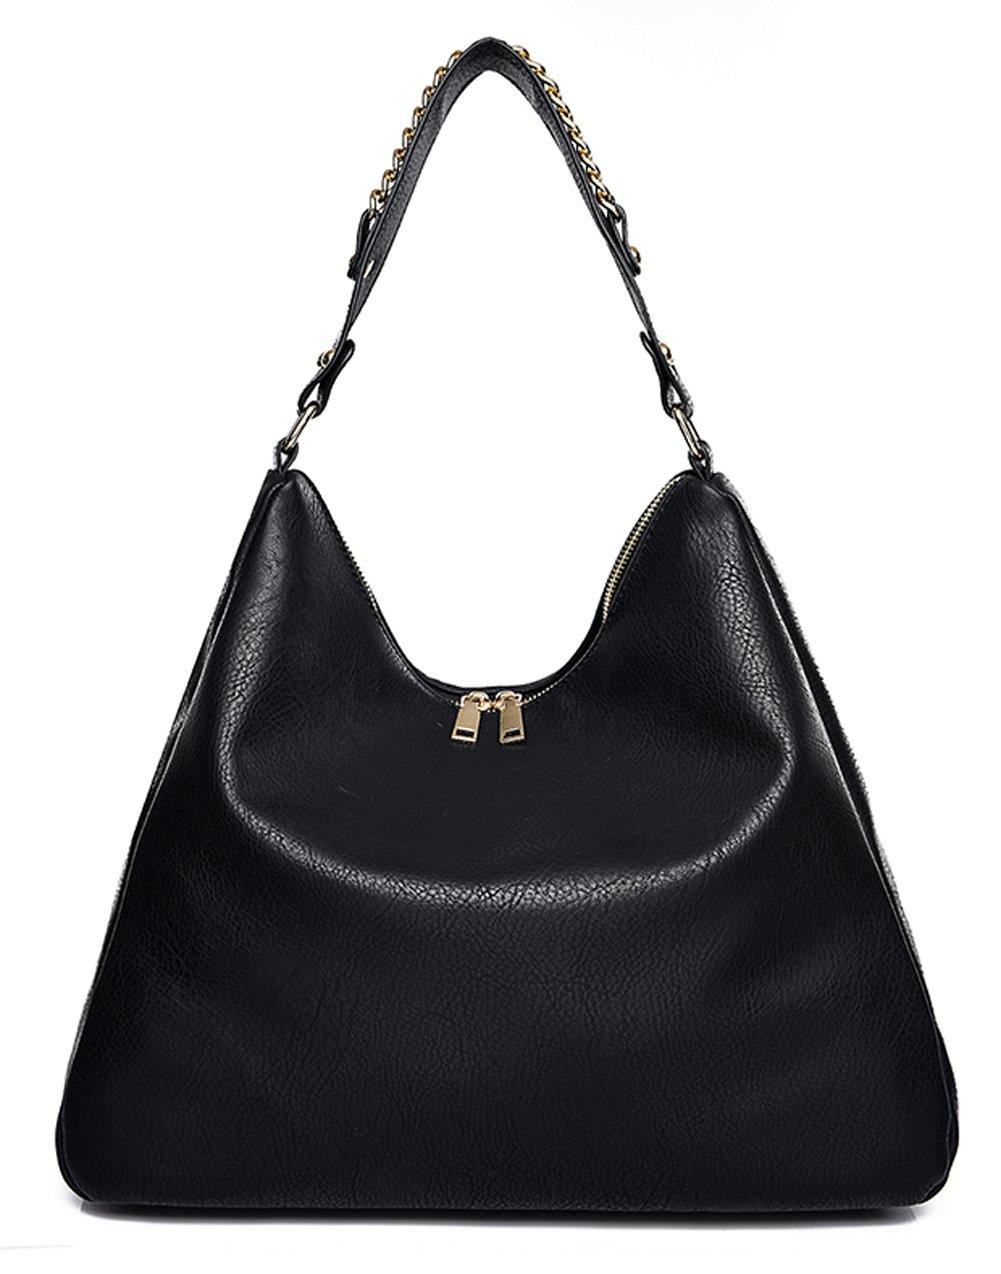 Covelin Women's Soft Leather Handbag Hobo Purse Large Capacity Tote Shoulder Bag Black